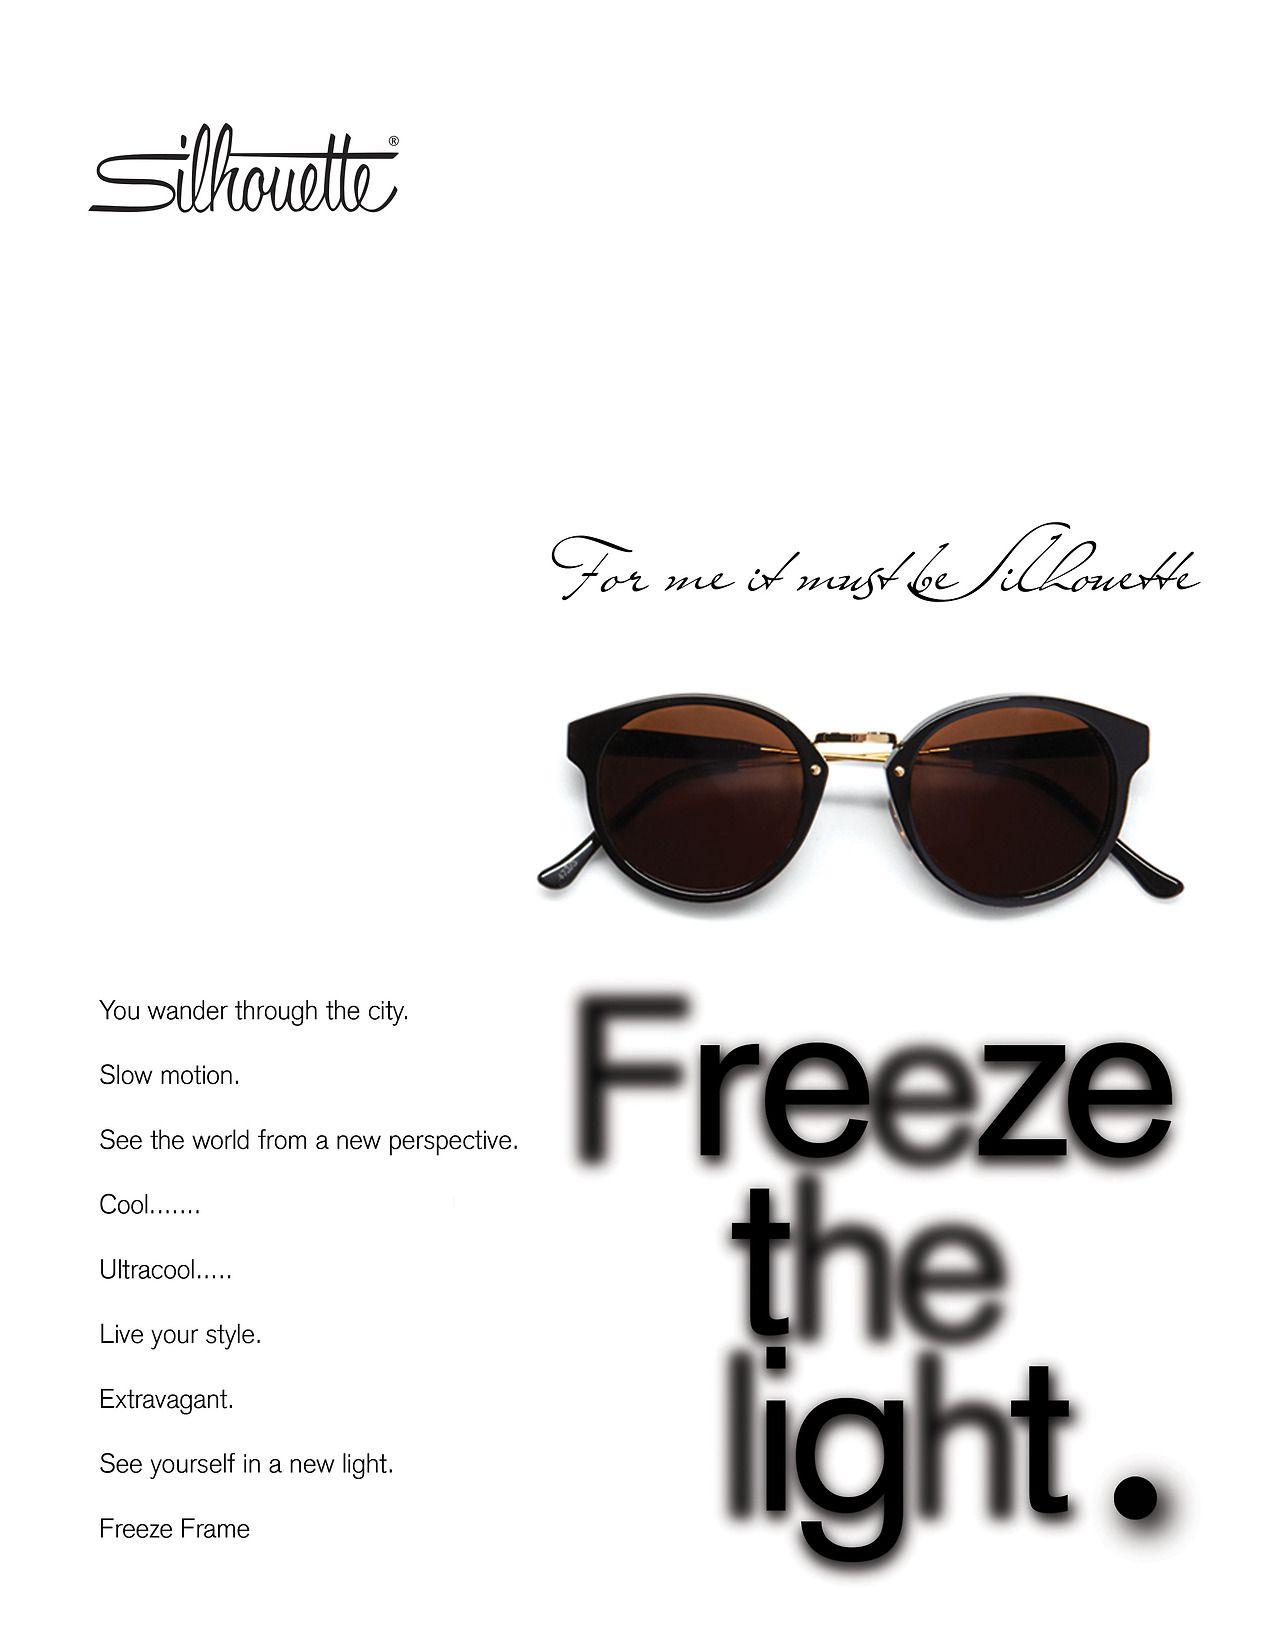 Sunglass ad poster